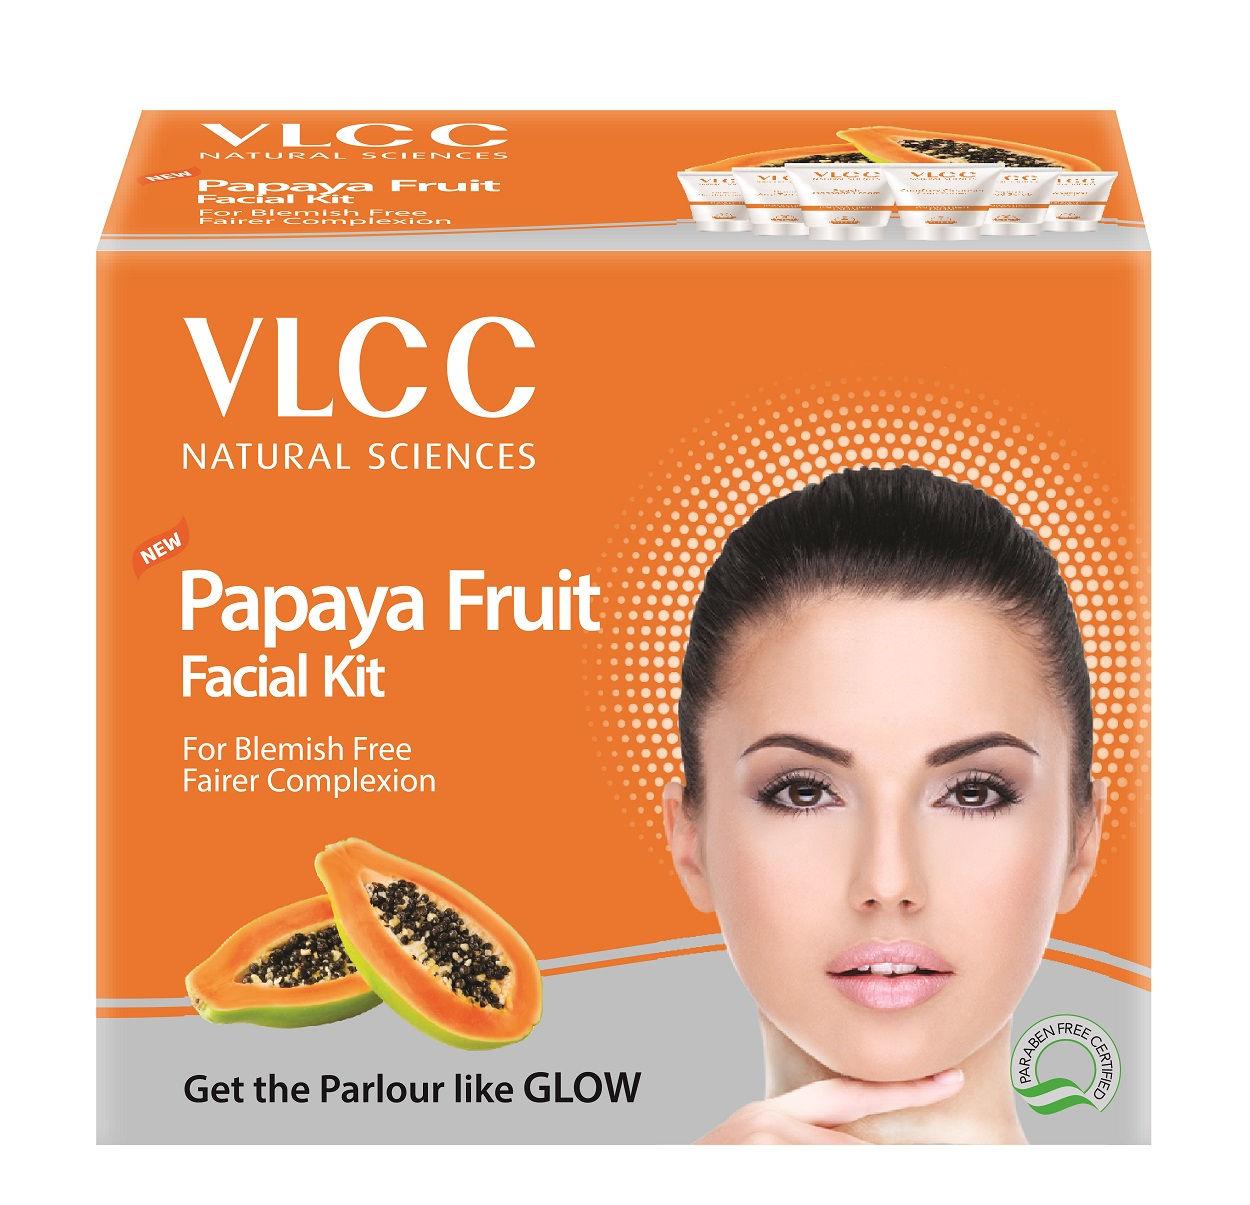 VLCC Papaya Fruit Single Facial Kit at Nykaa.com